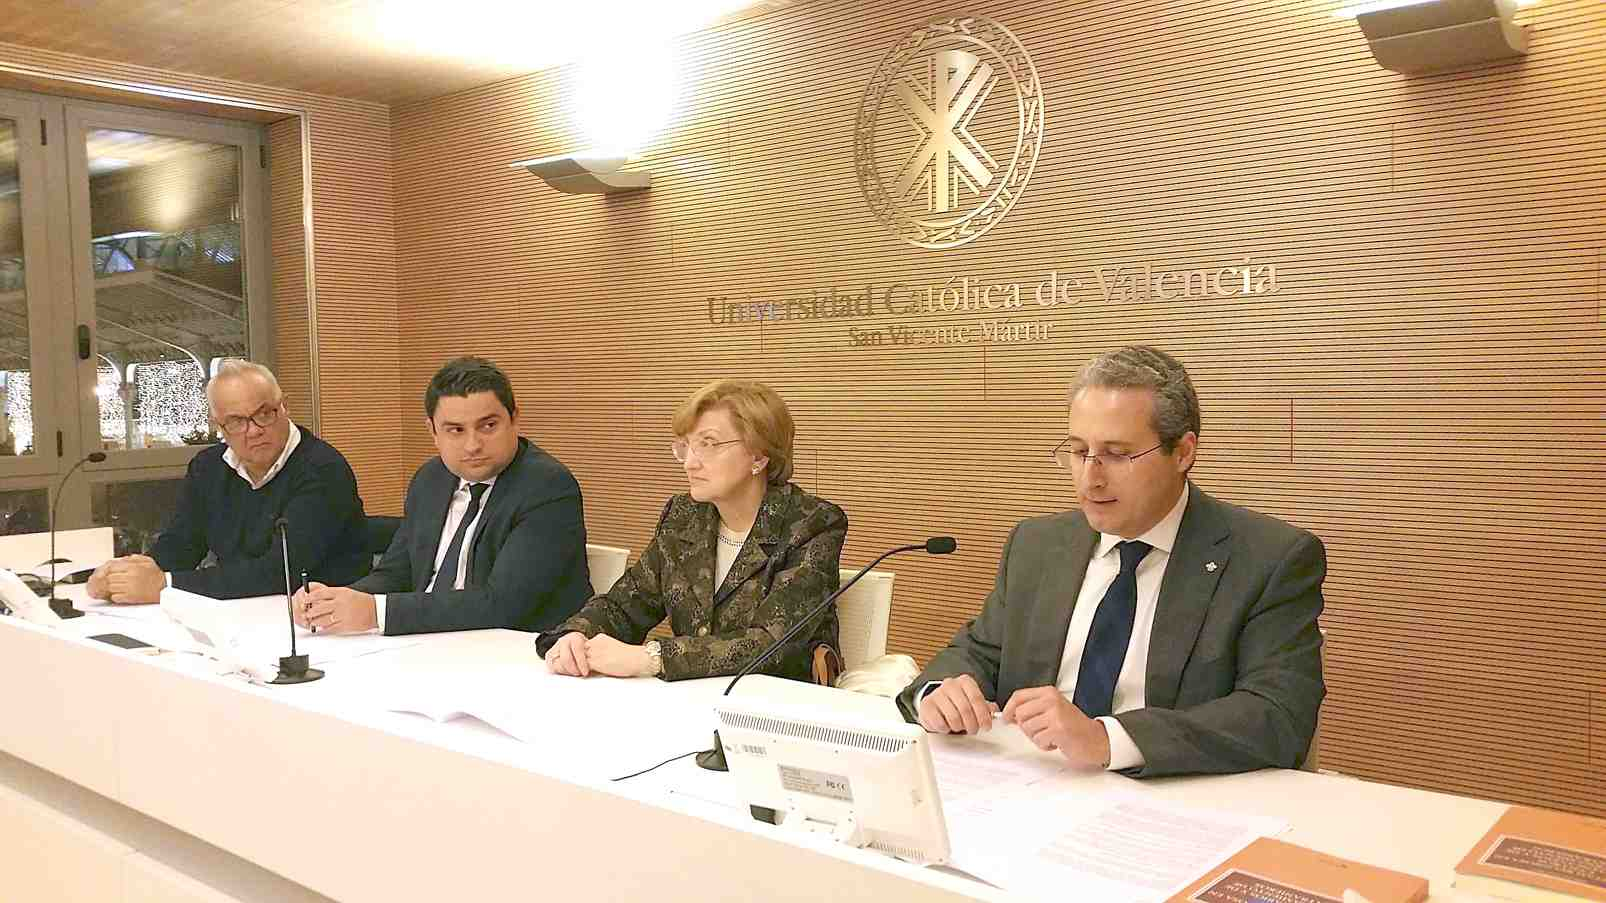 El salesià ibense Alberto Payá presenta el seu llibre a València